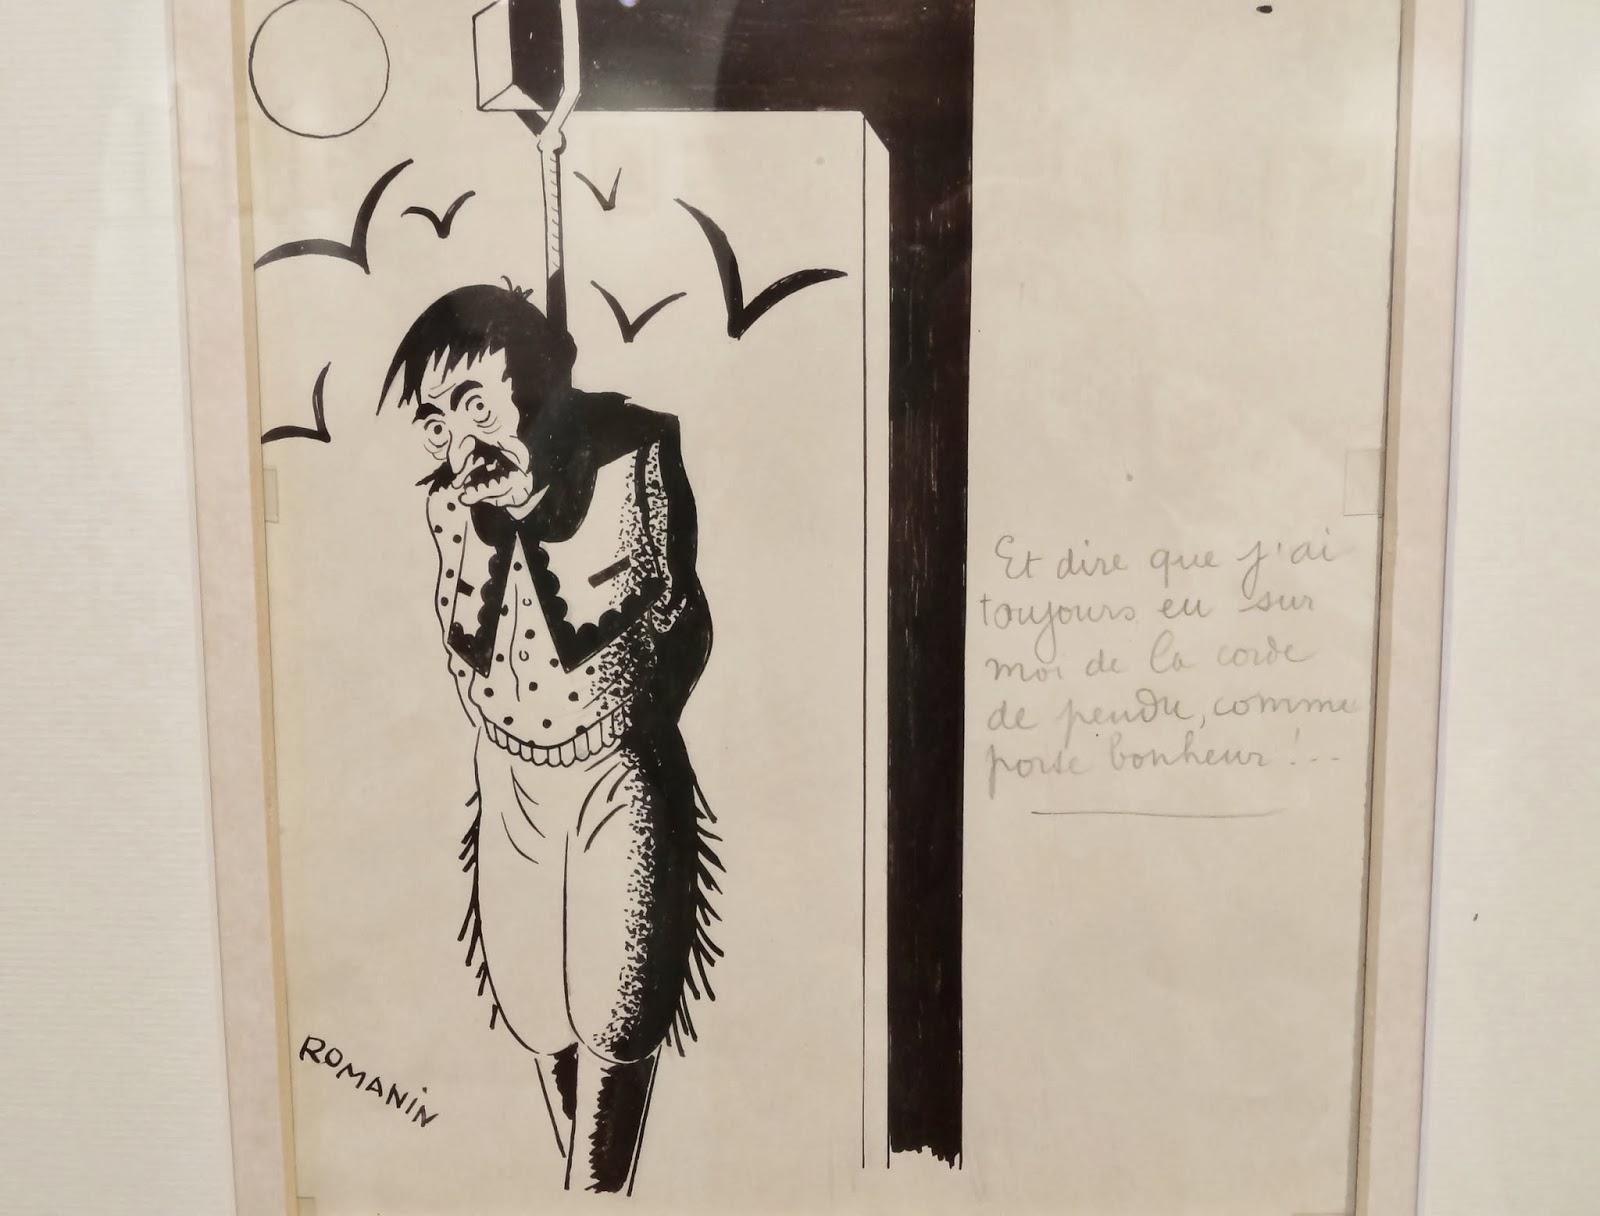 Jean+Moulin+-+le+condamn%25C3%25A9+%25C3%25A0+mort.JPG